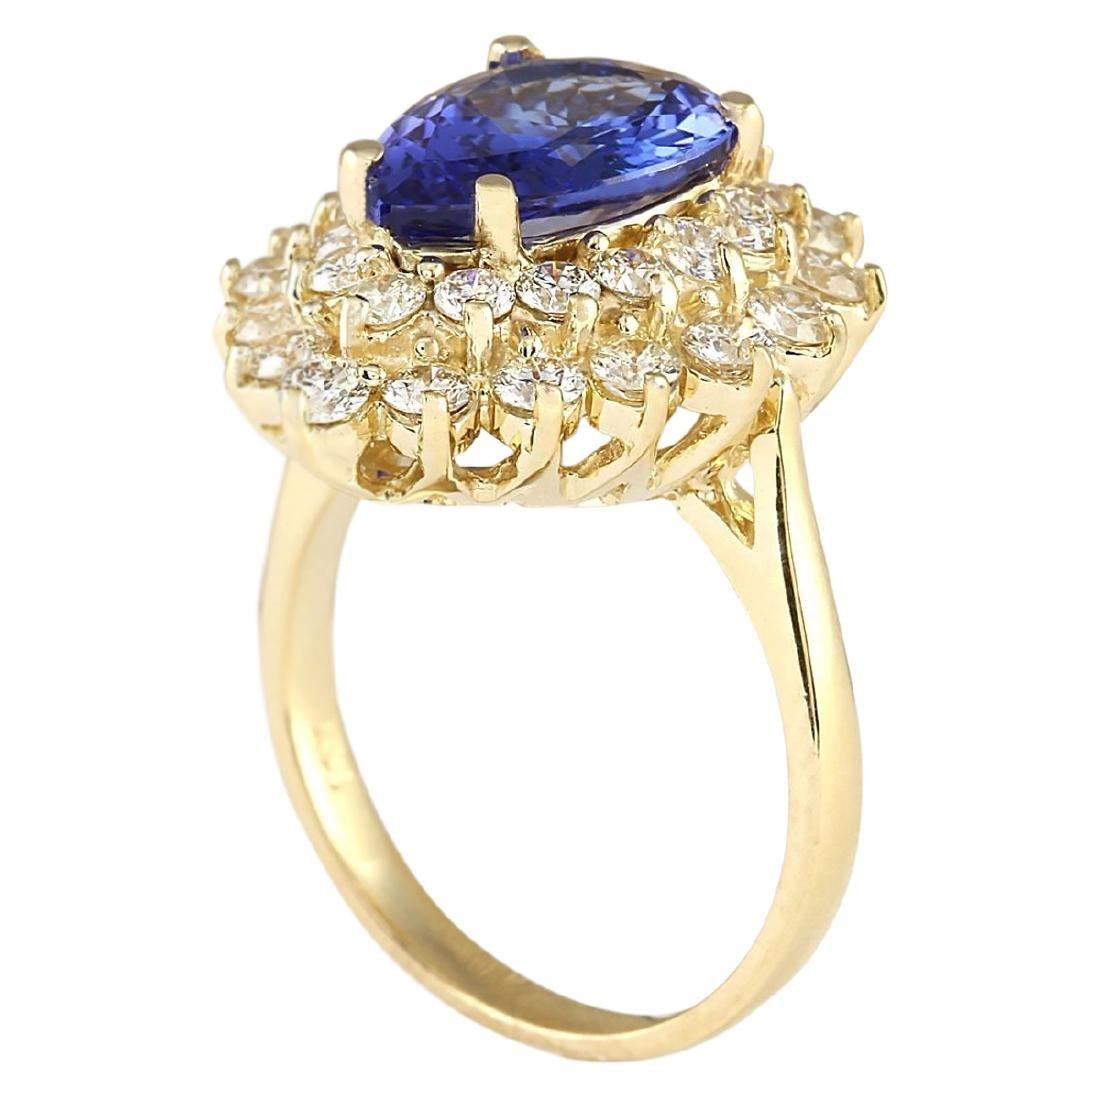 4.73 CTW Natural Blue Tanzanite And Diamond Ring 18K - 3